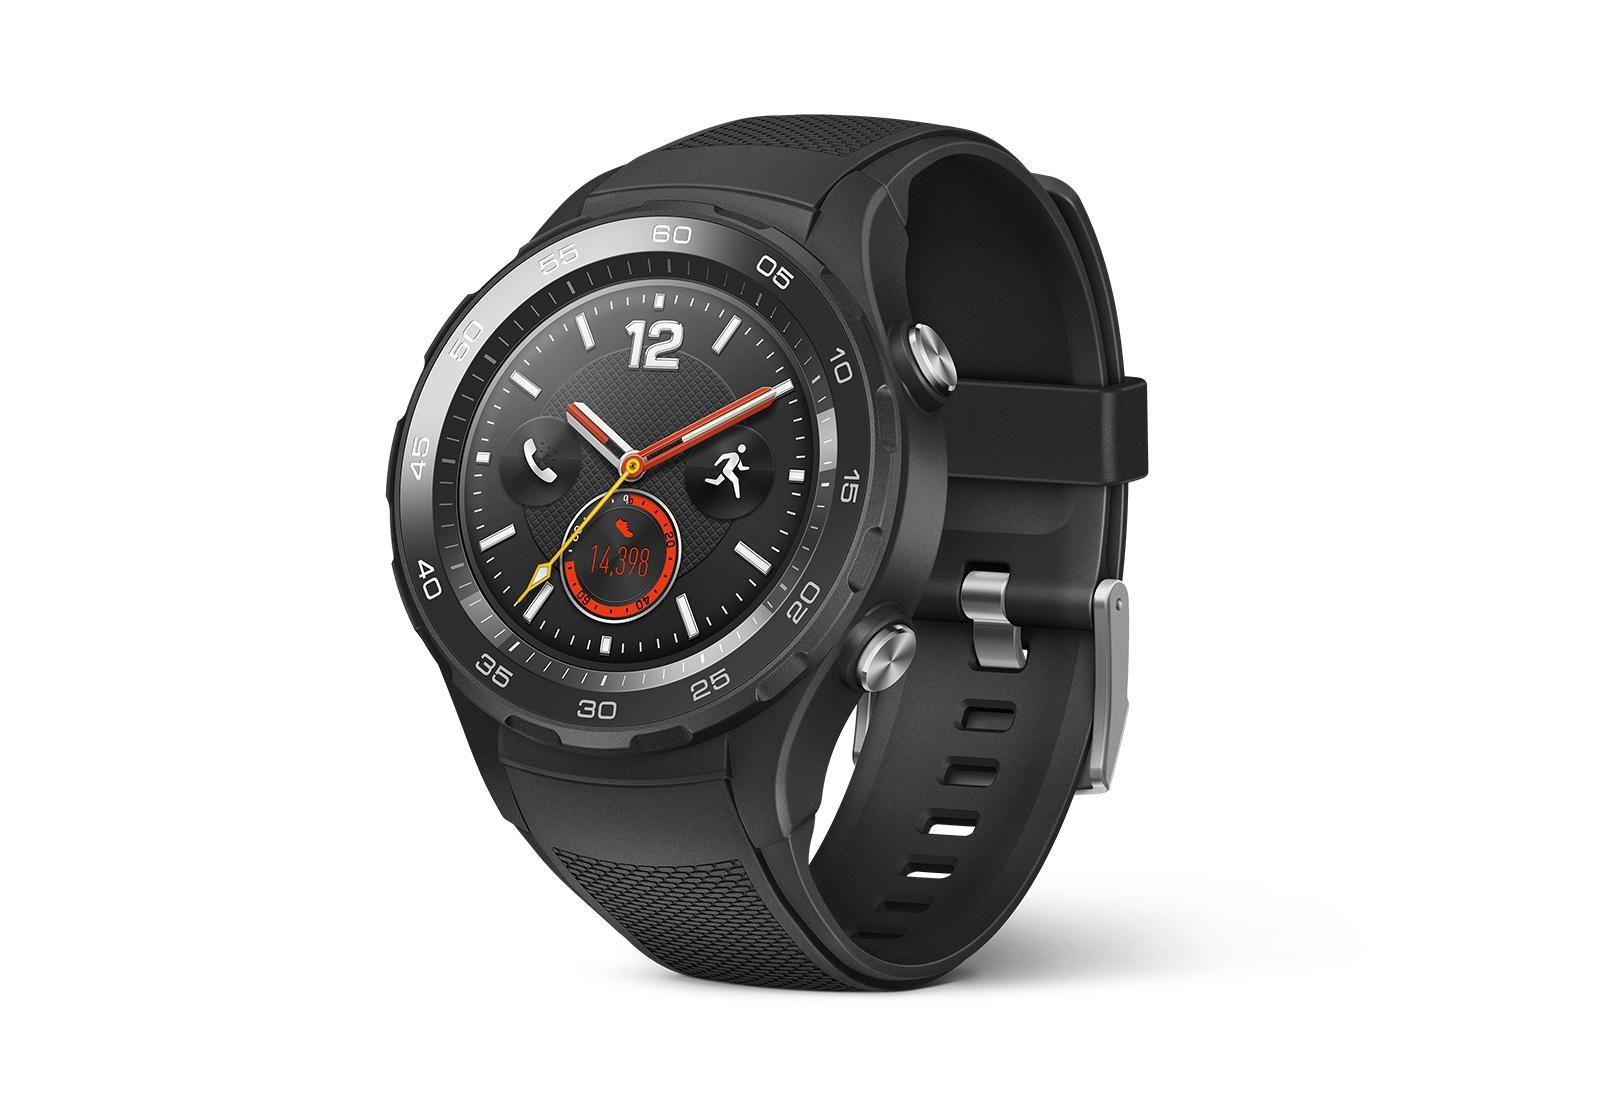 Montre connectée Huawei watch 2 4G (ODR 50 + 50€)